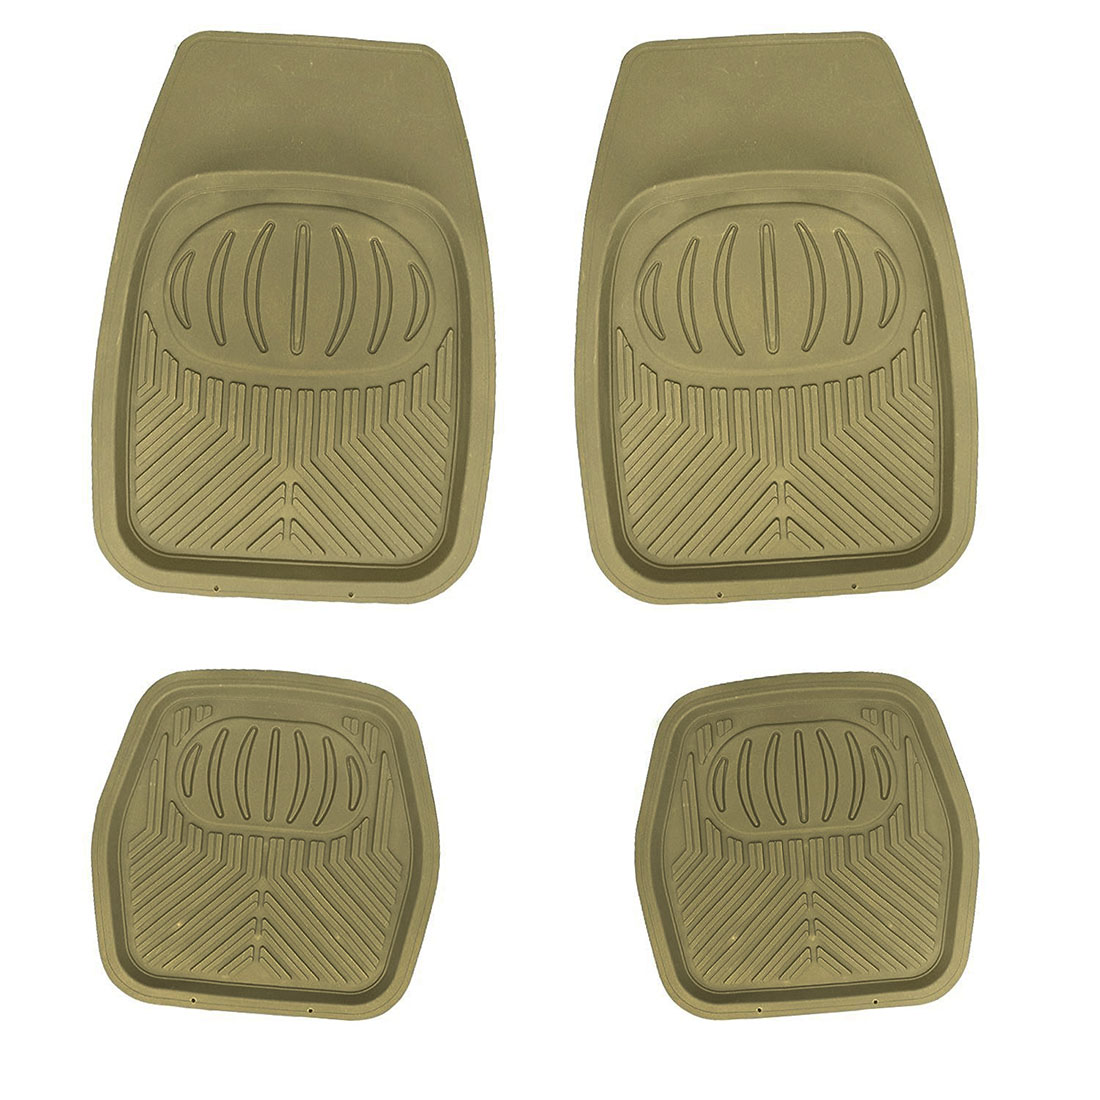 Rubber floor mats toyota camry - Multi Season Rubber Floor Mats 4pc Set Beige Fit Most Cars Suvs Vans And